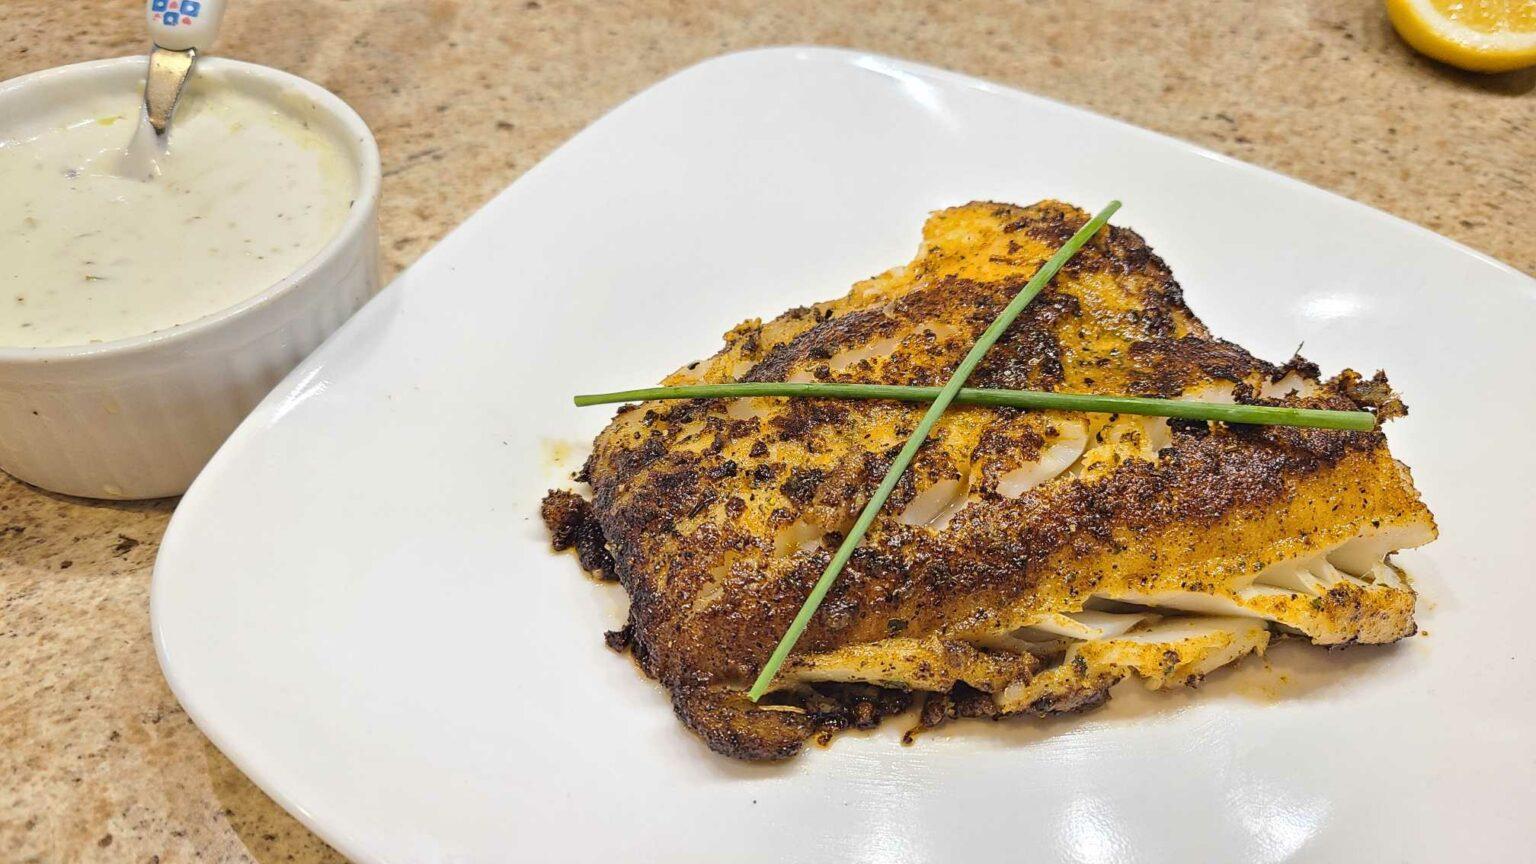 Blackened Cod Recipe With White Sauce